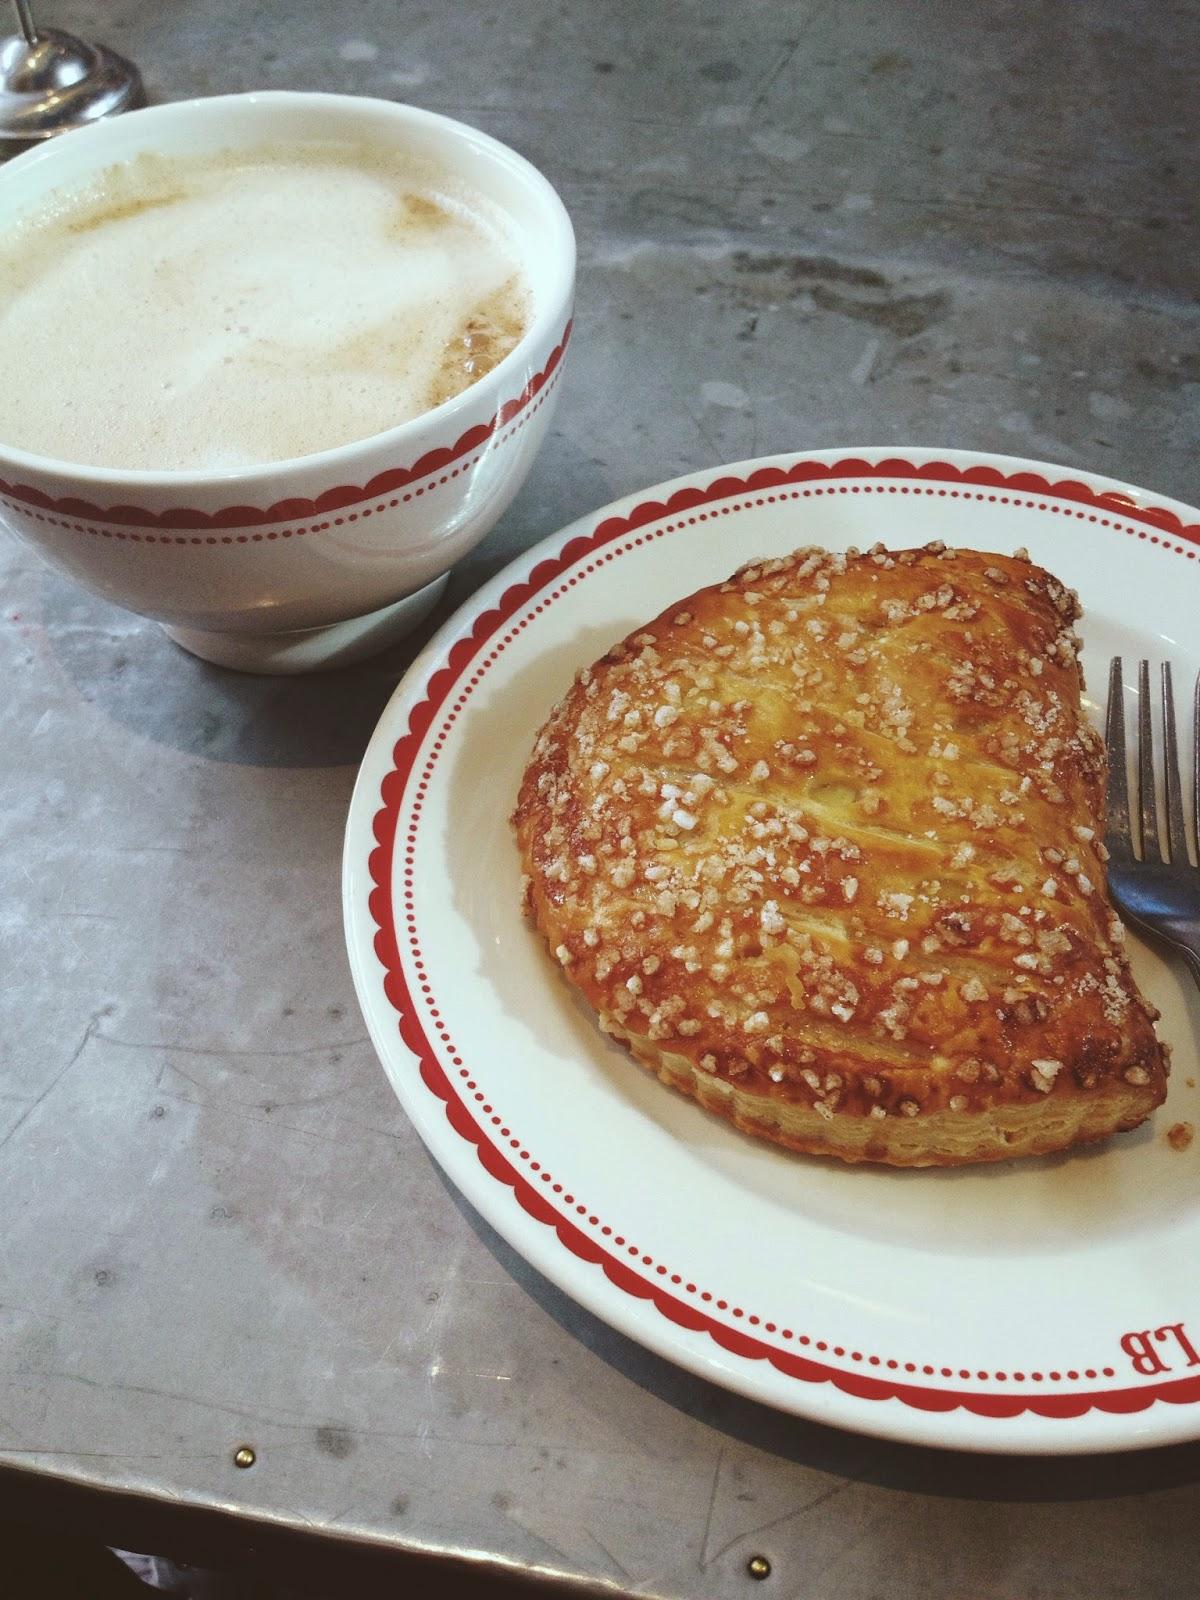 La Boulange: Lemon Turnover and Chai Tea Latte